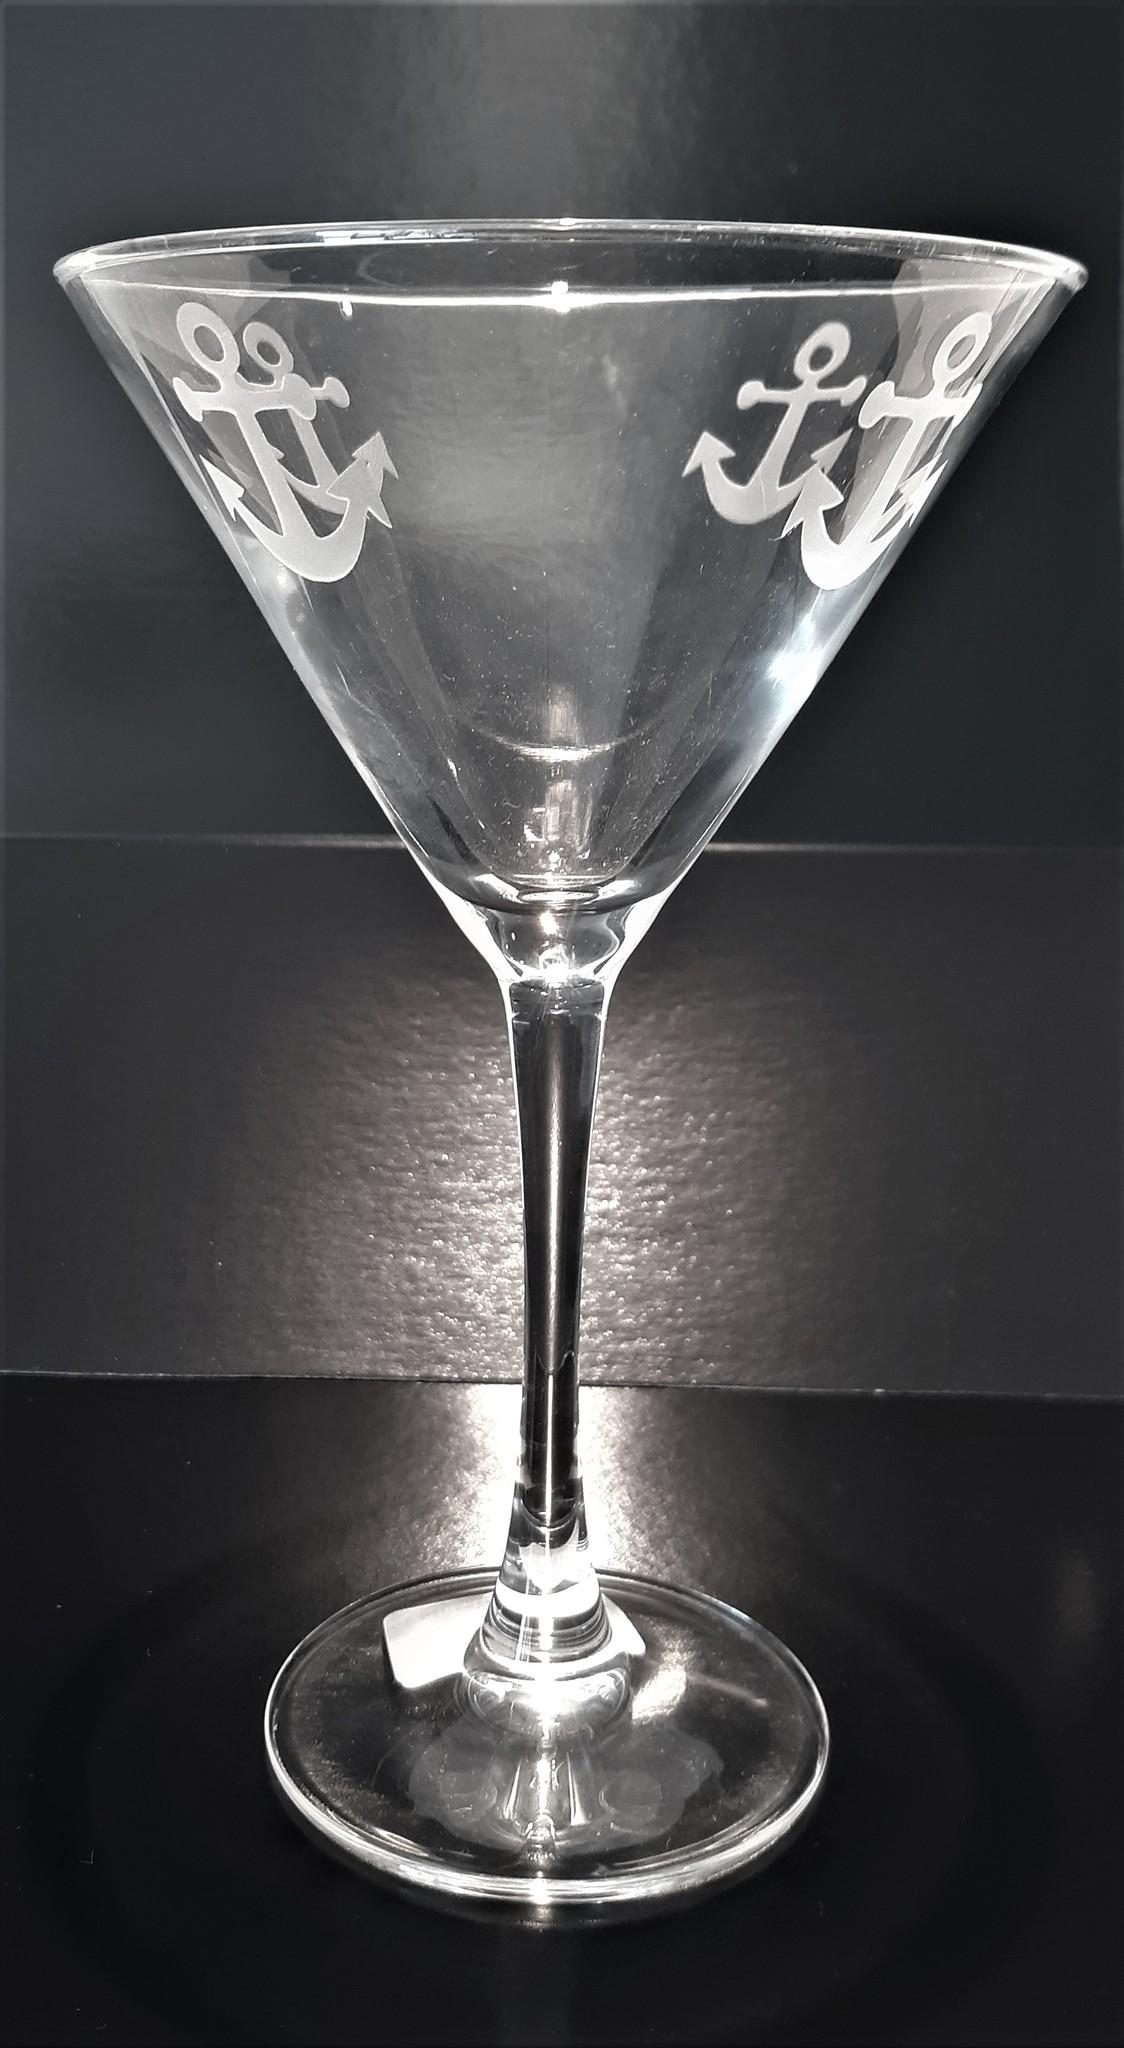 Rolf Glass Anchor Martini 10oz